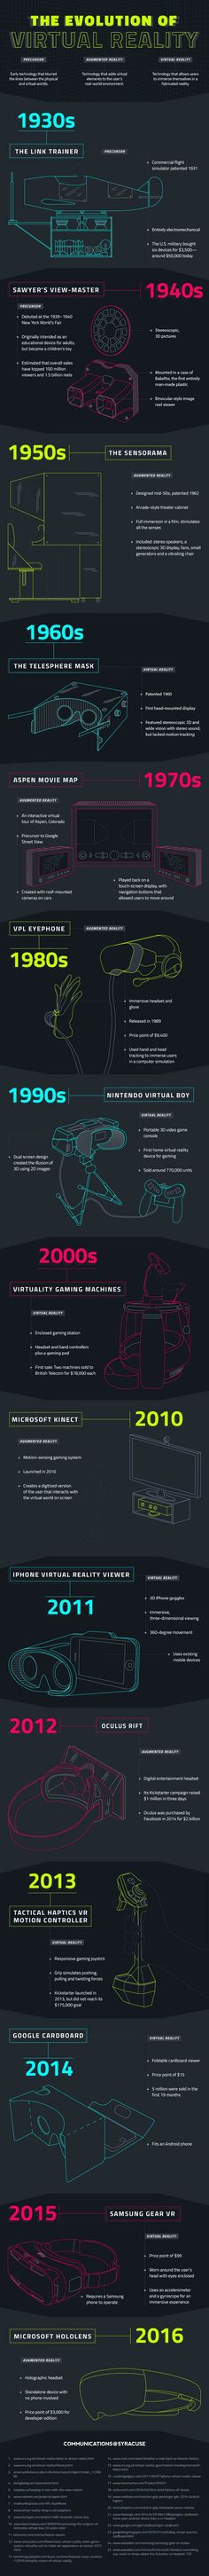 The Evolution Of Virtual Reality #Infographic #VirtualReality